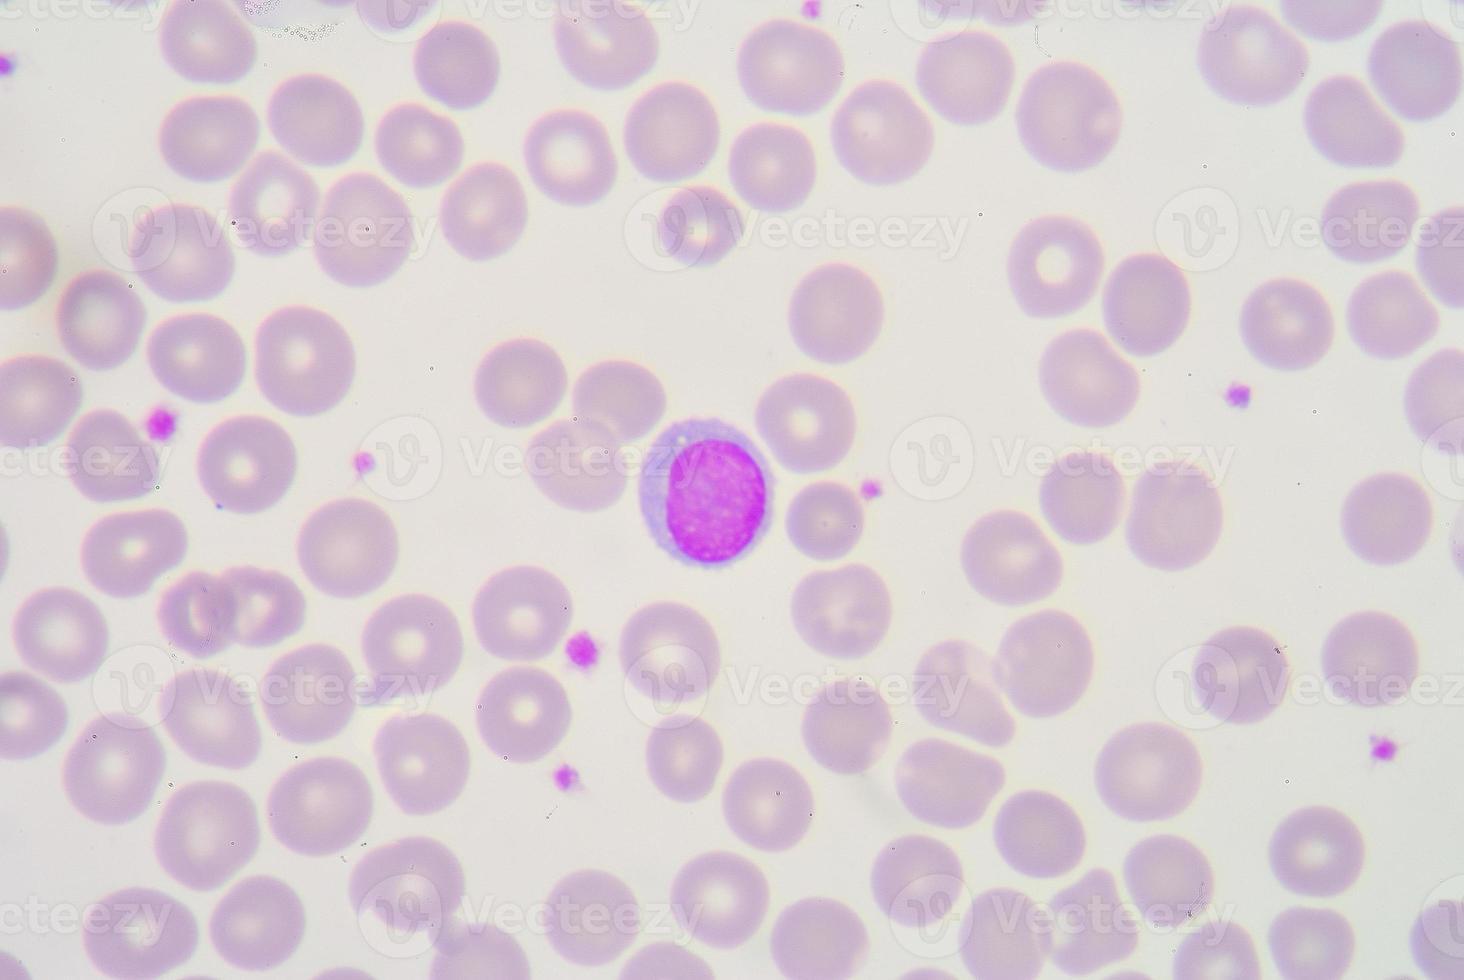 lymphocyte photo